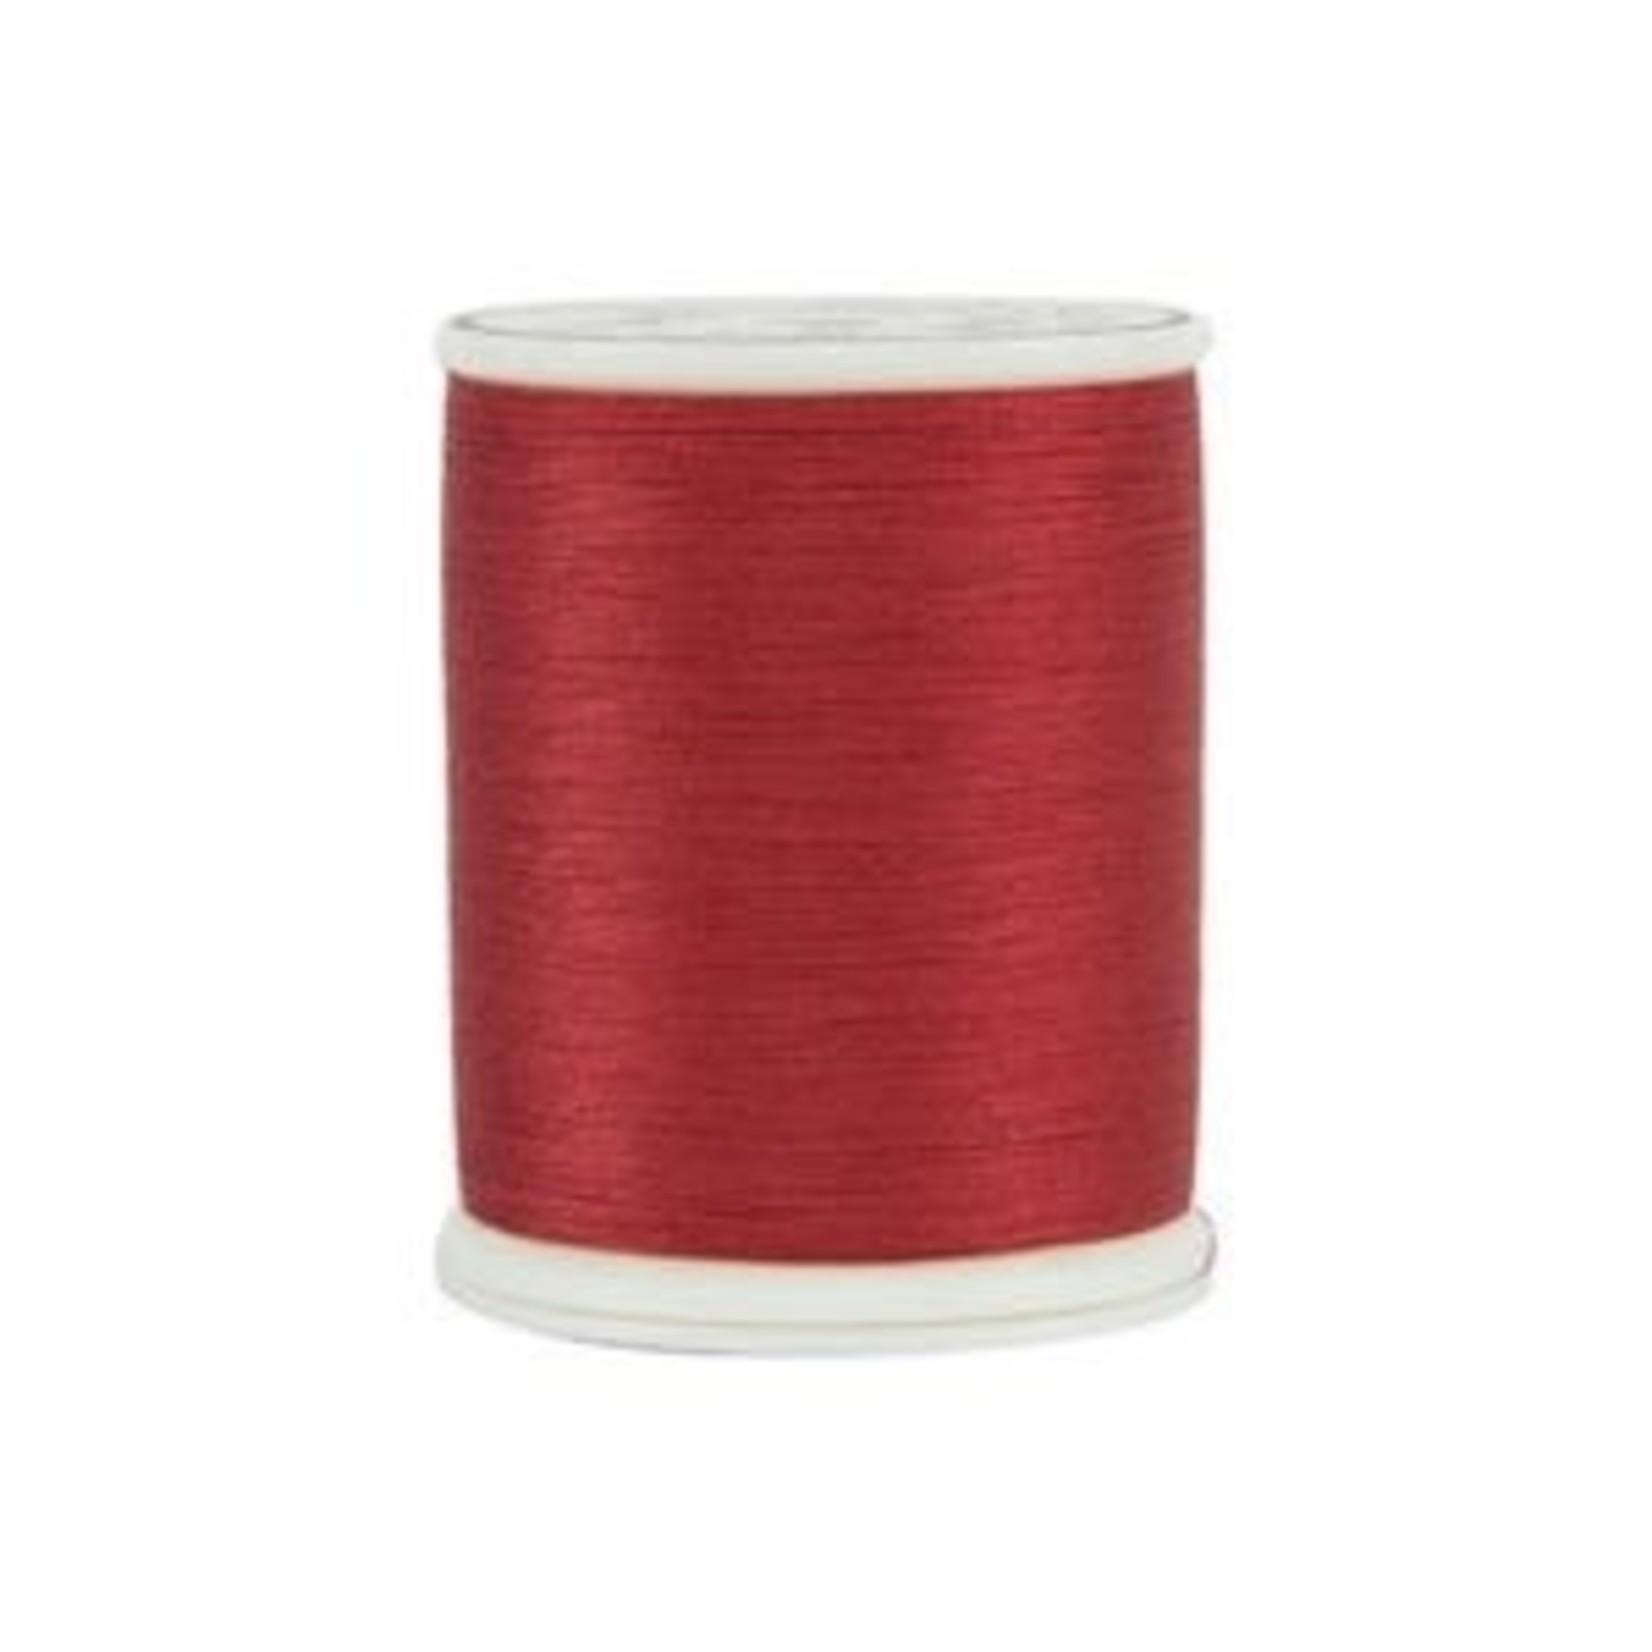 Superior Threads King Tut - #40 - 457 m - 1021 Amish Red